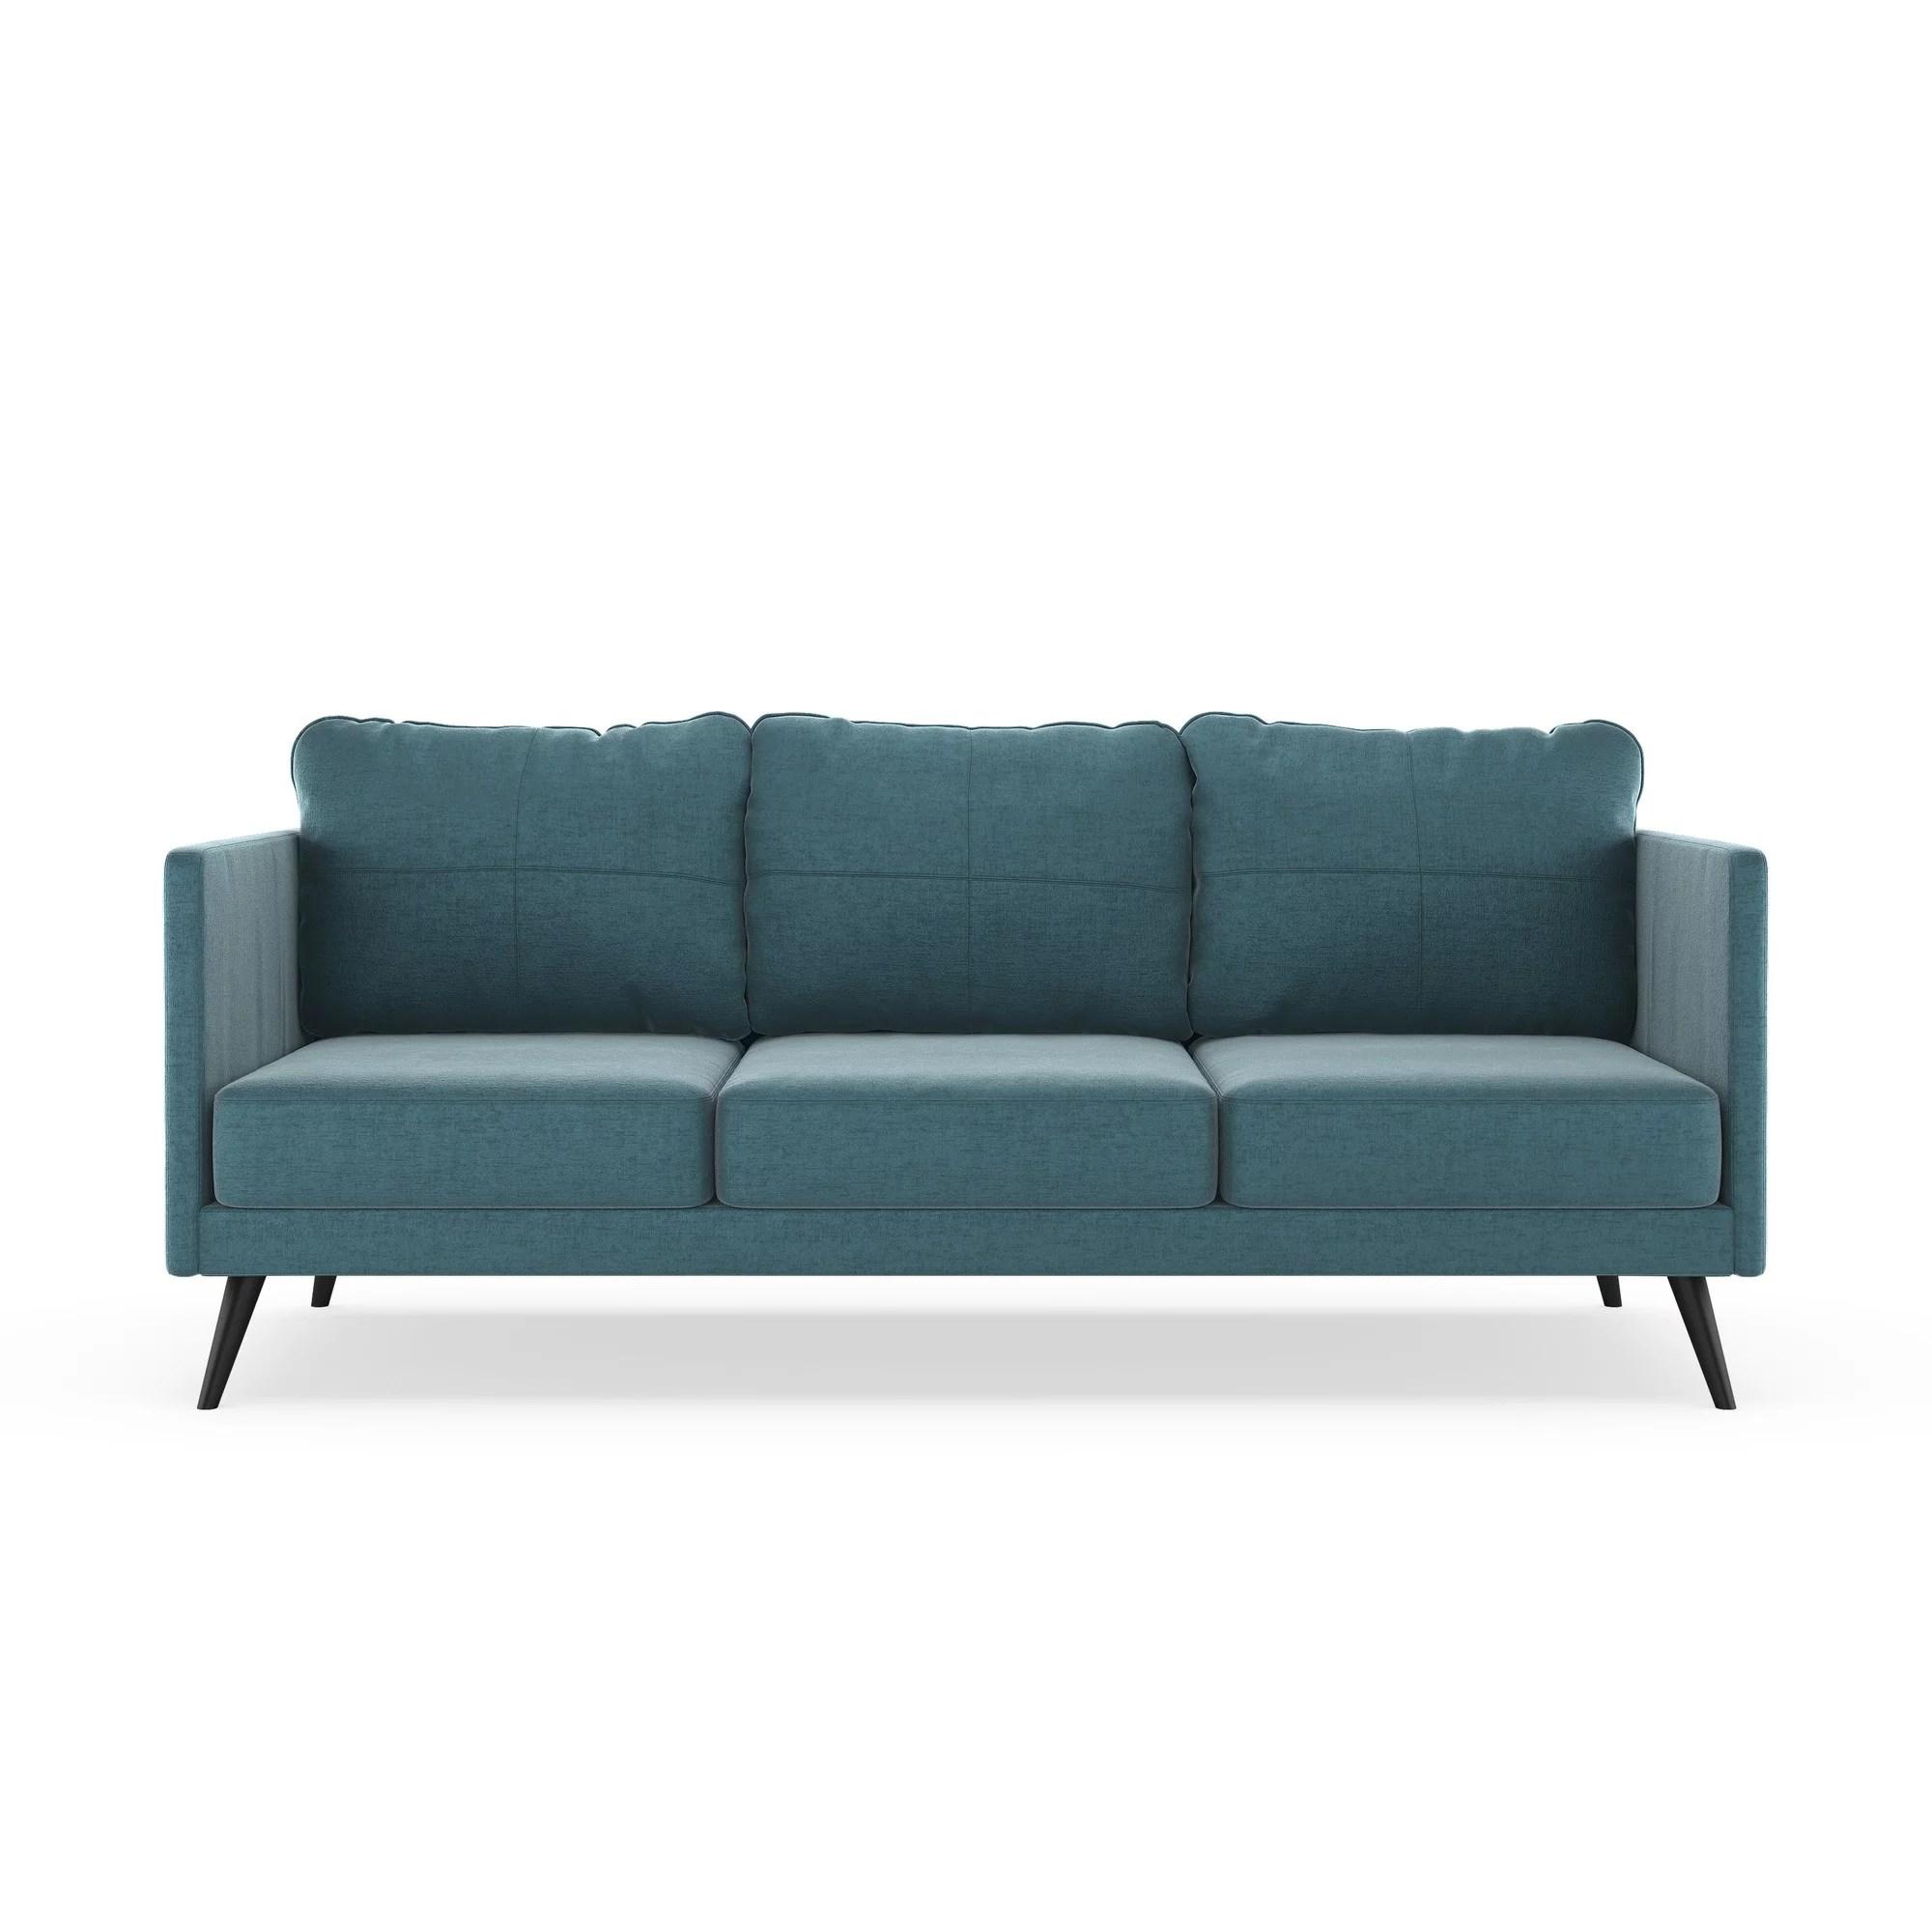 monroe sofa small sectional bobs furniture mod velvet steel blue walmart